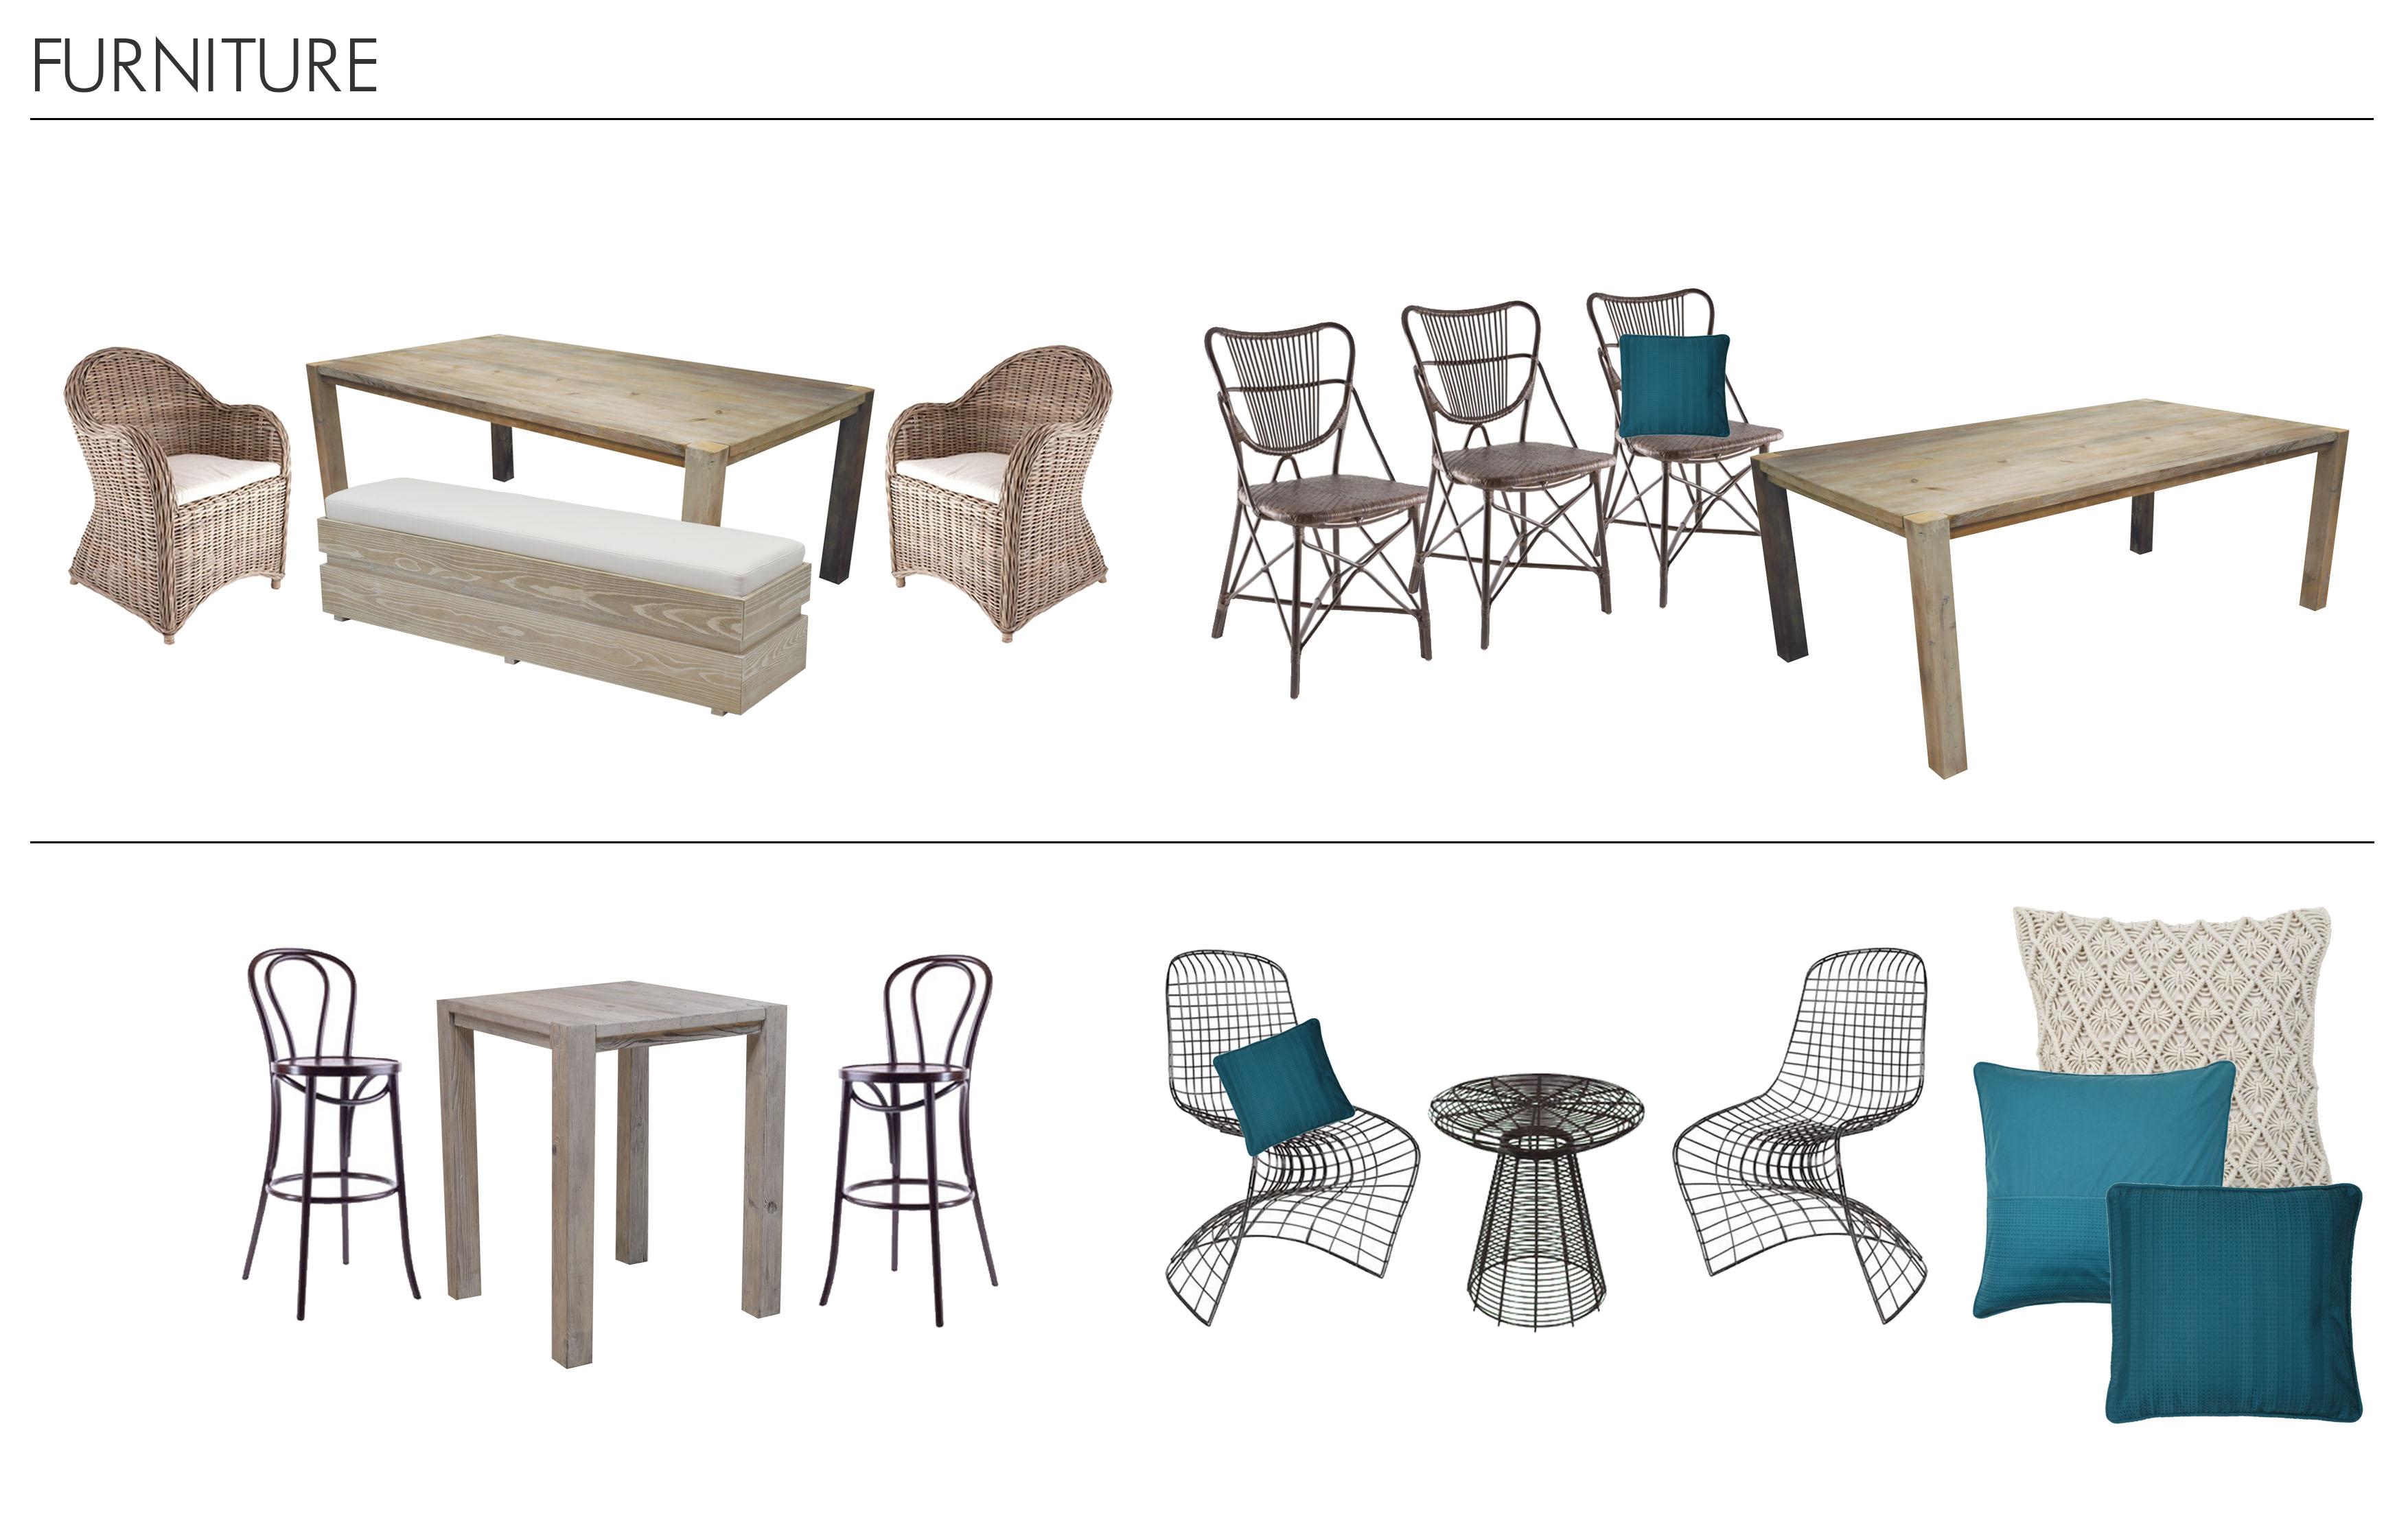 Furniture Moodboard